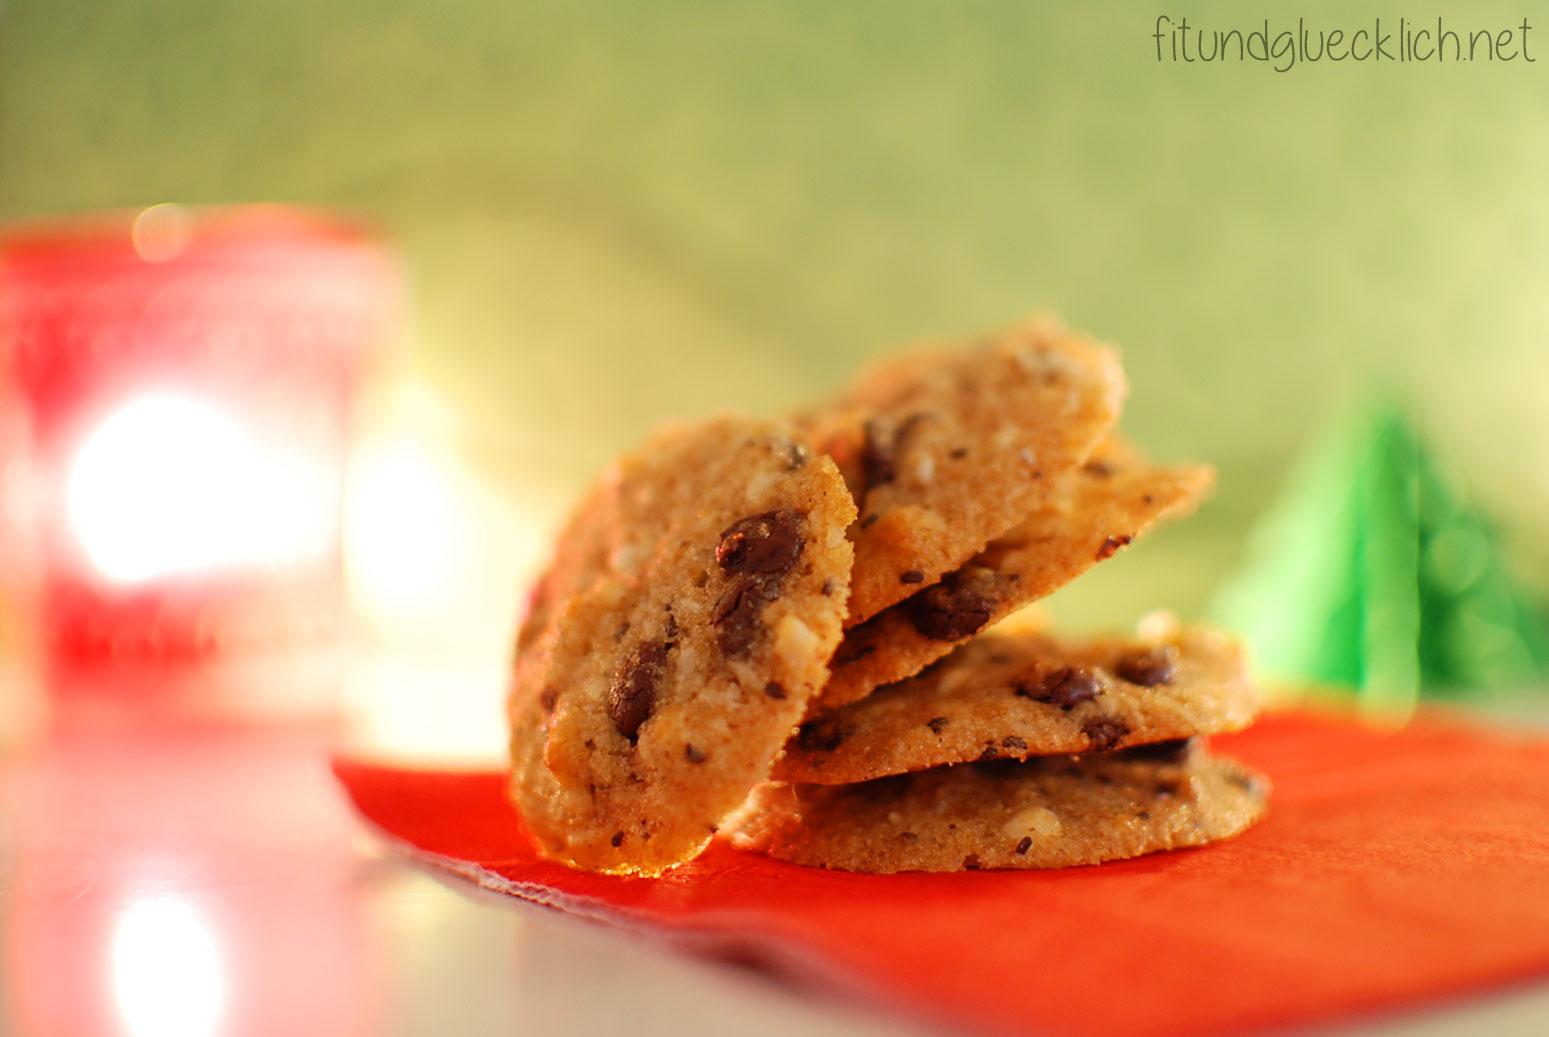 clean eating, recipe, rezept, backen, baking, cookies, kekse, weihnachten, christmas, cashews, kokos, coconut, chocolate, schokolade, fitundgluecklich.net